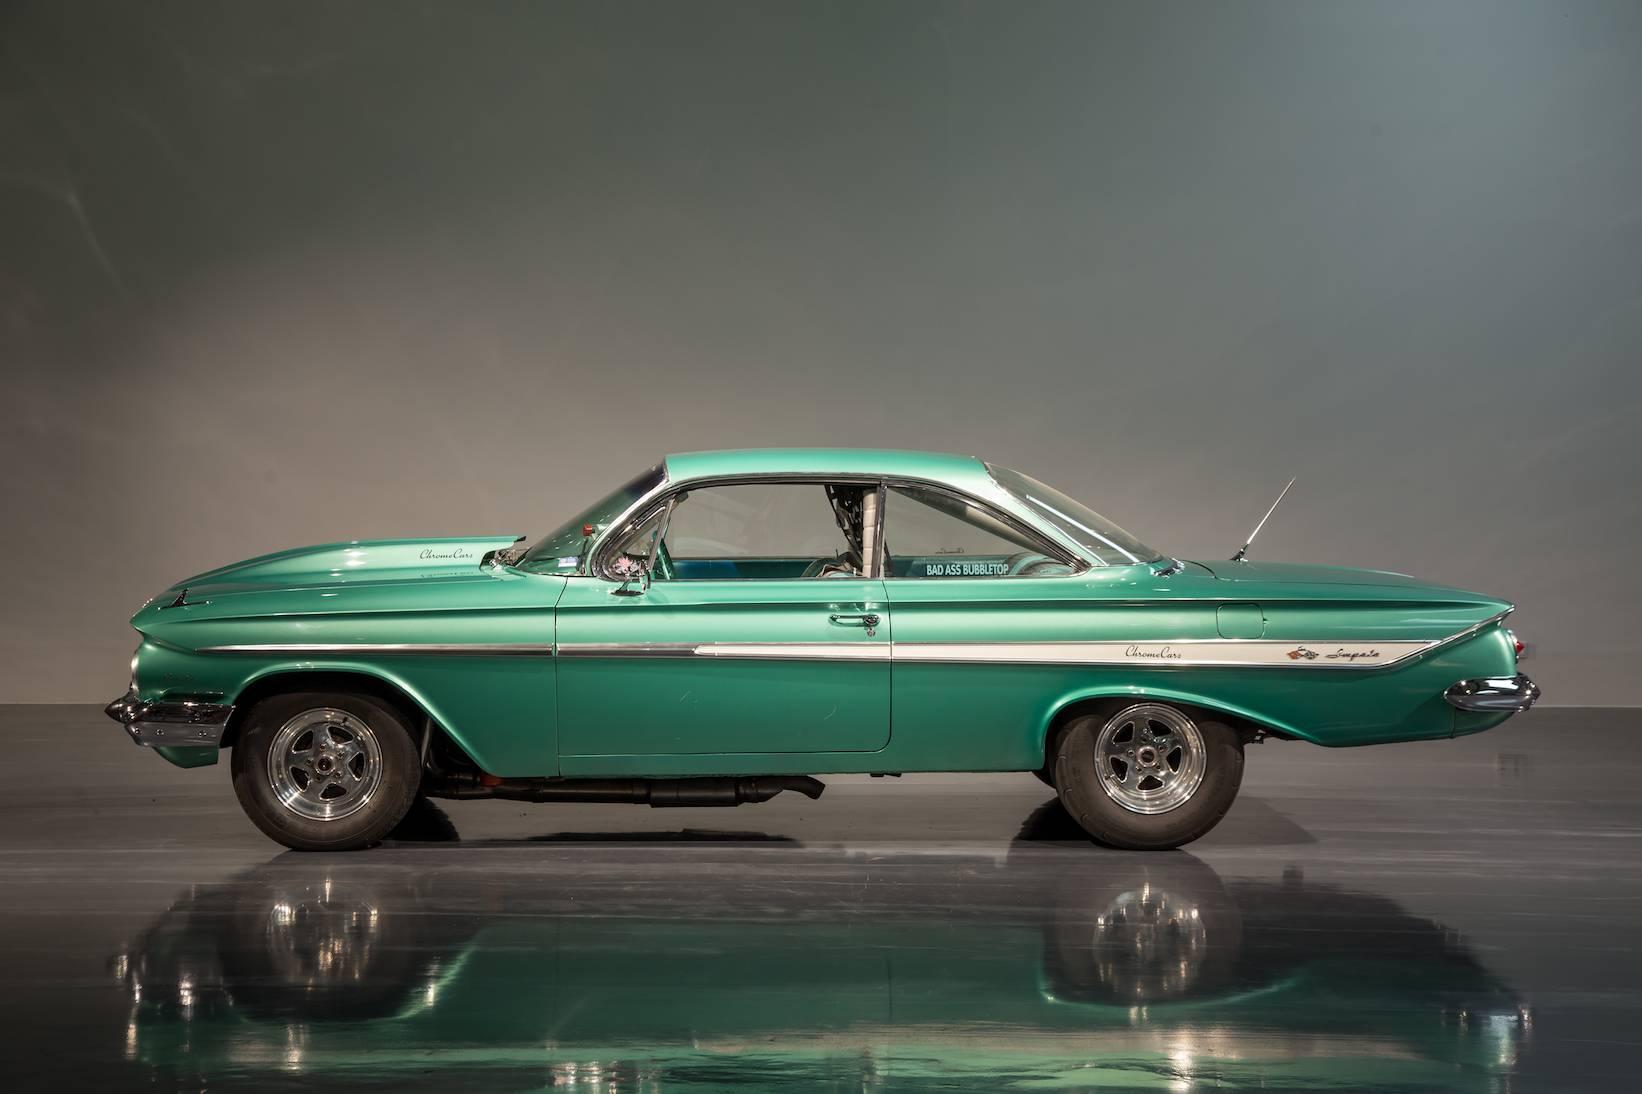 chevrolet impala sport coupe 1961 f r eur kaufen. Black Bedroom Furniture Sets. Home Design Ideas